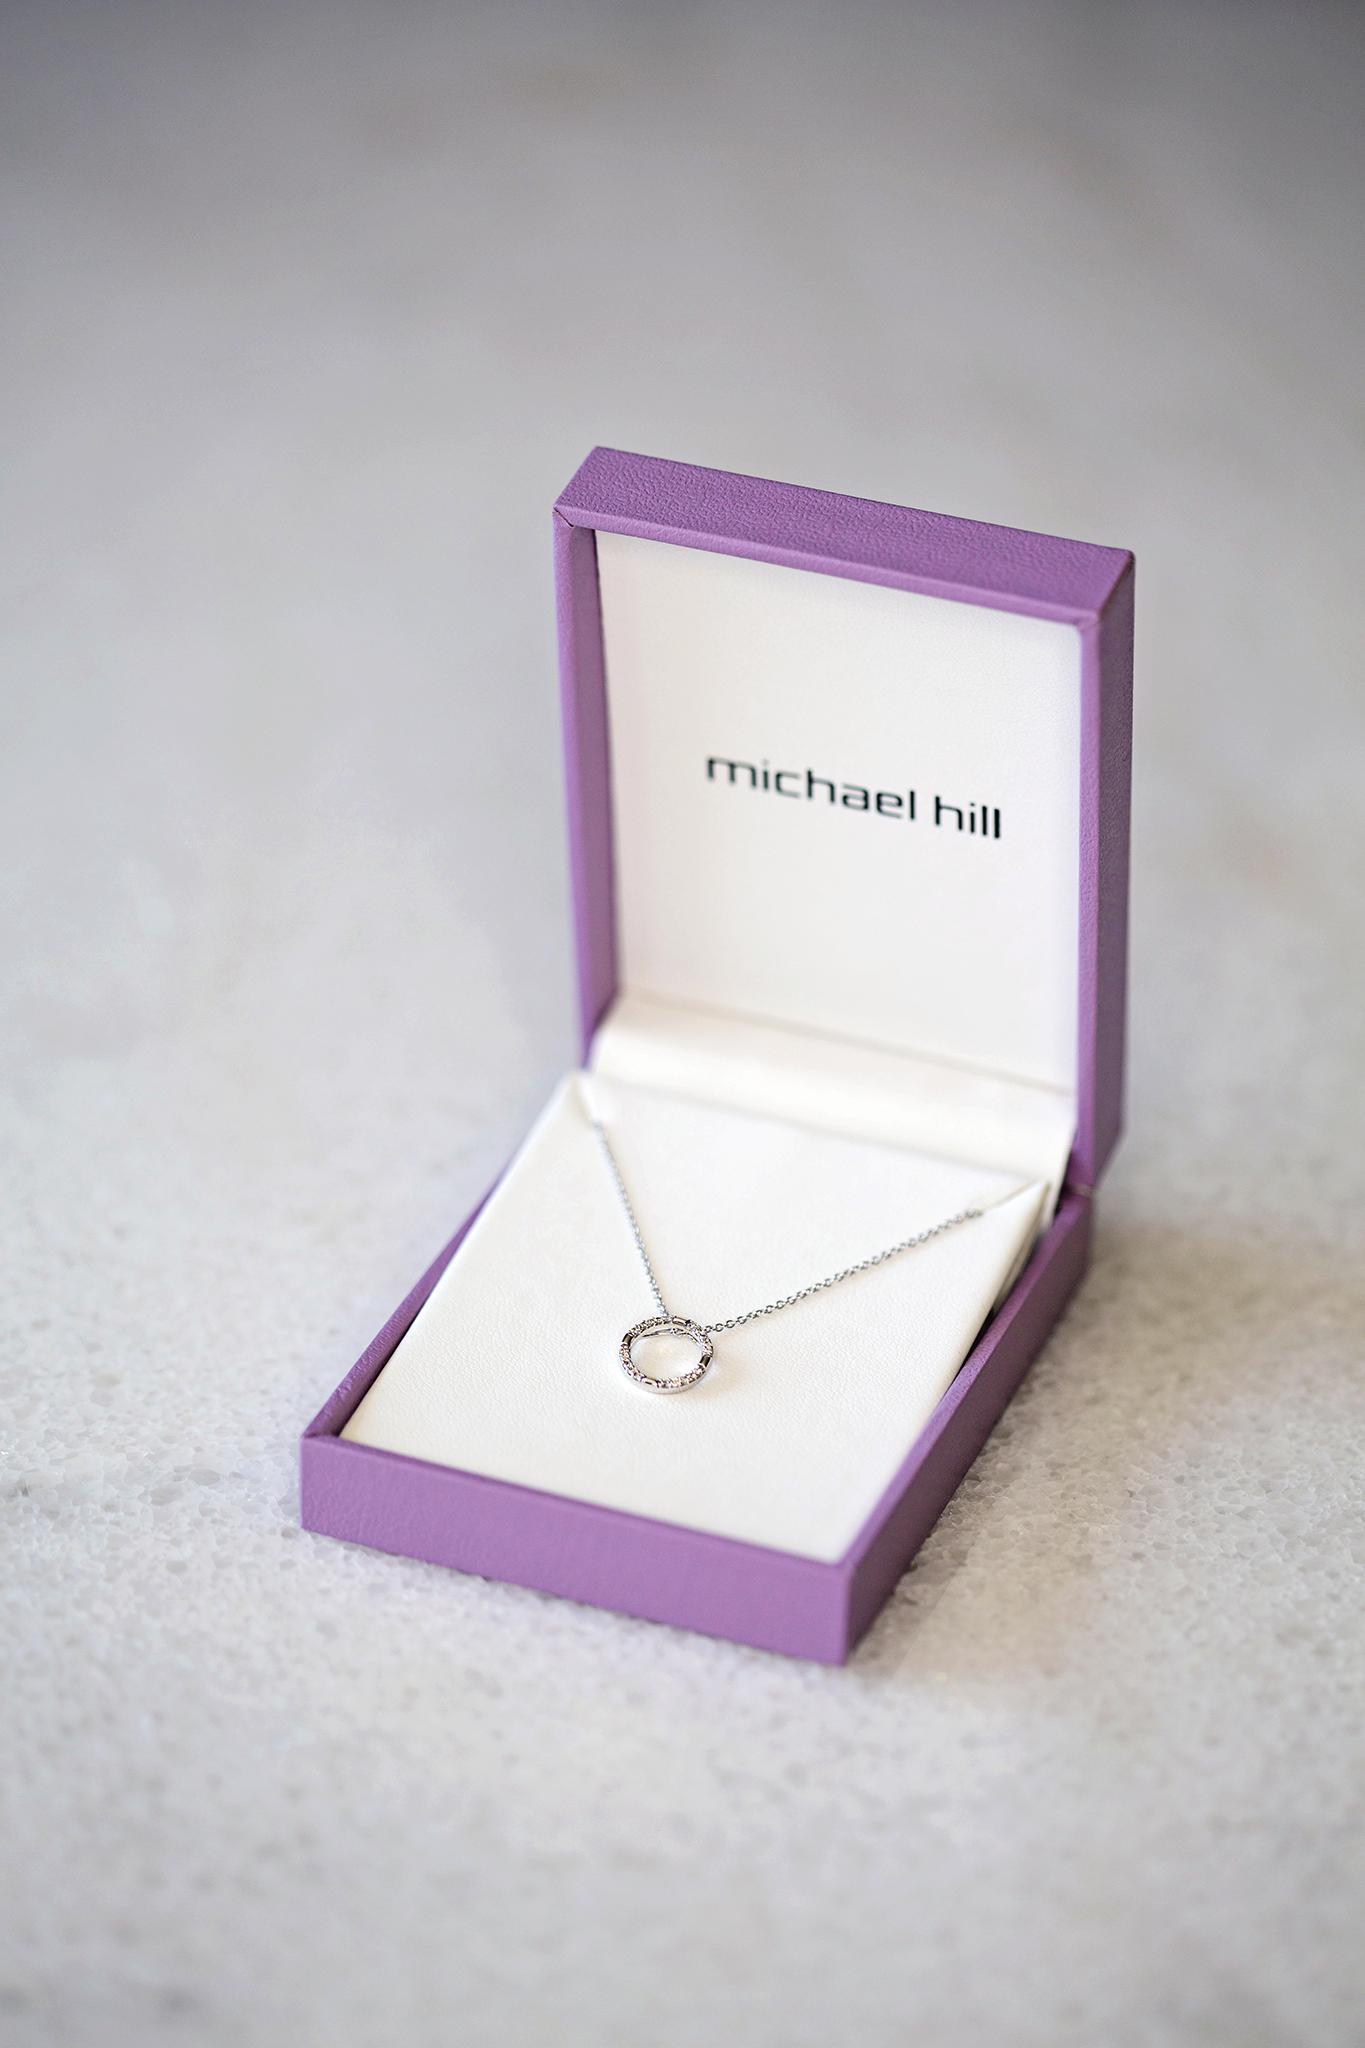 Michael Hill jewellery